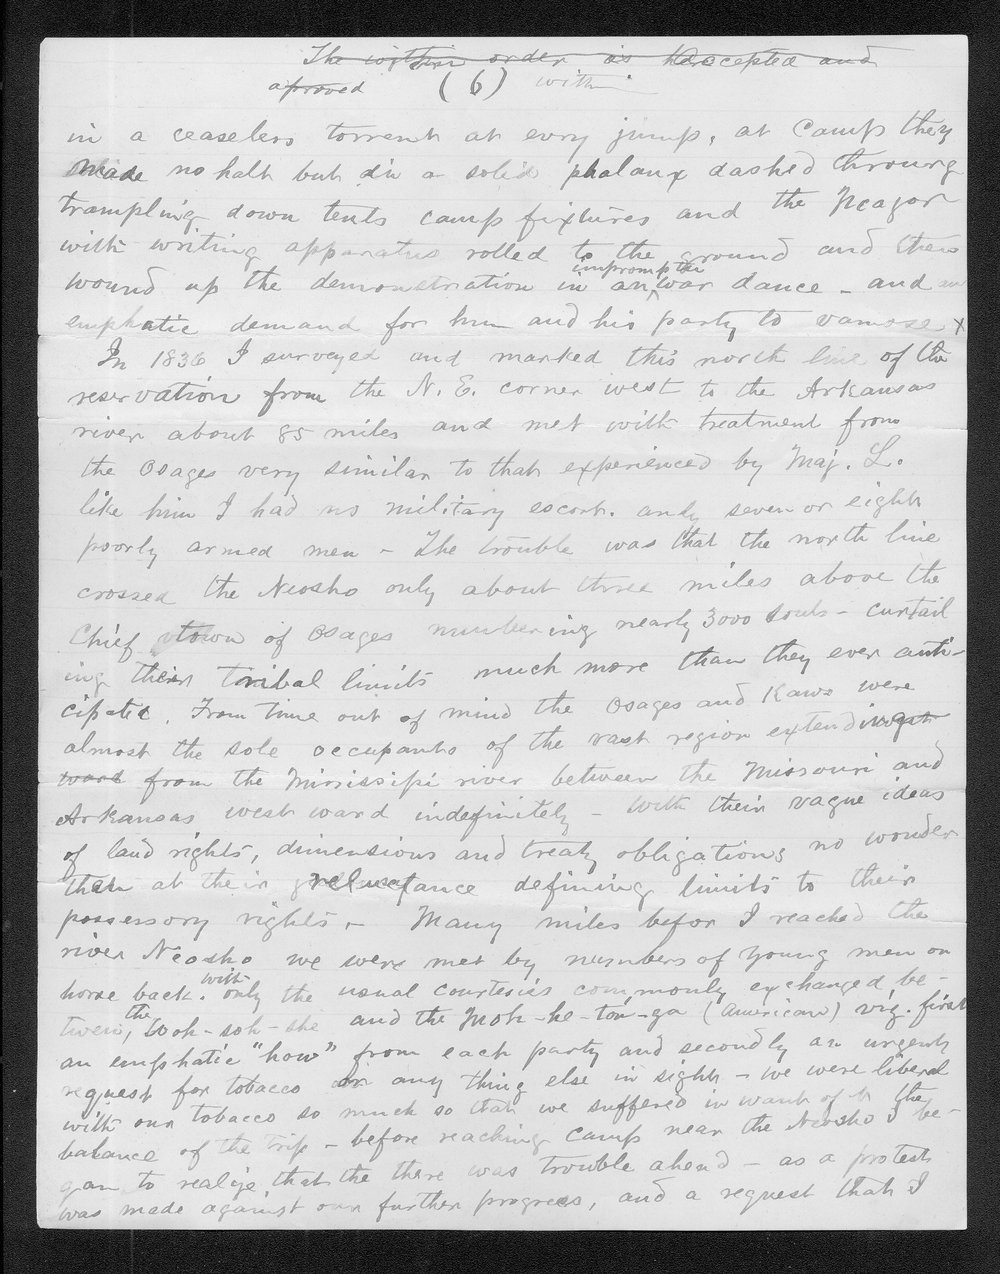 John C. McCoy to Franklin G. Adams - 6